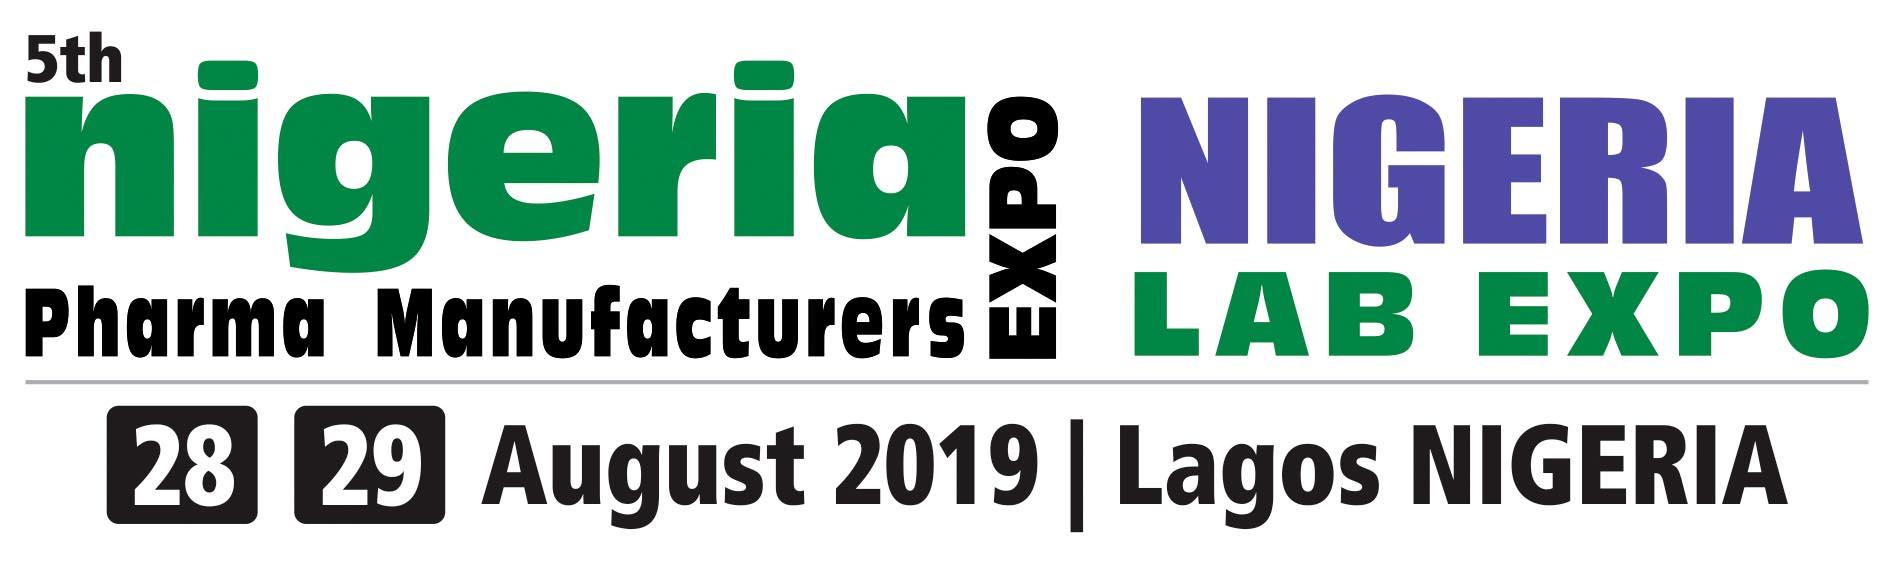 Nigeria Pharma Expo 2019